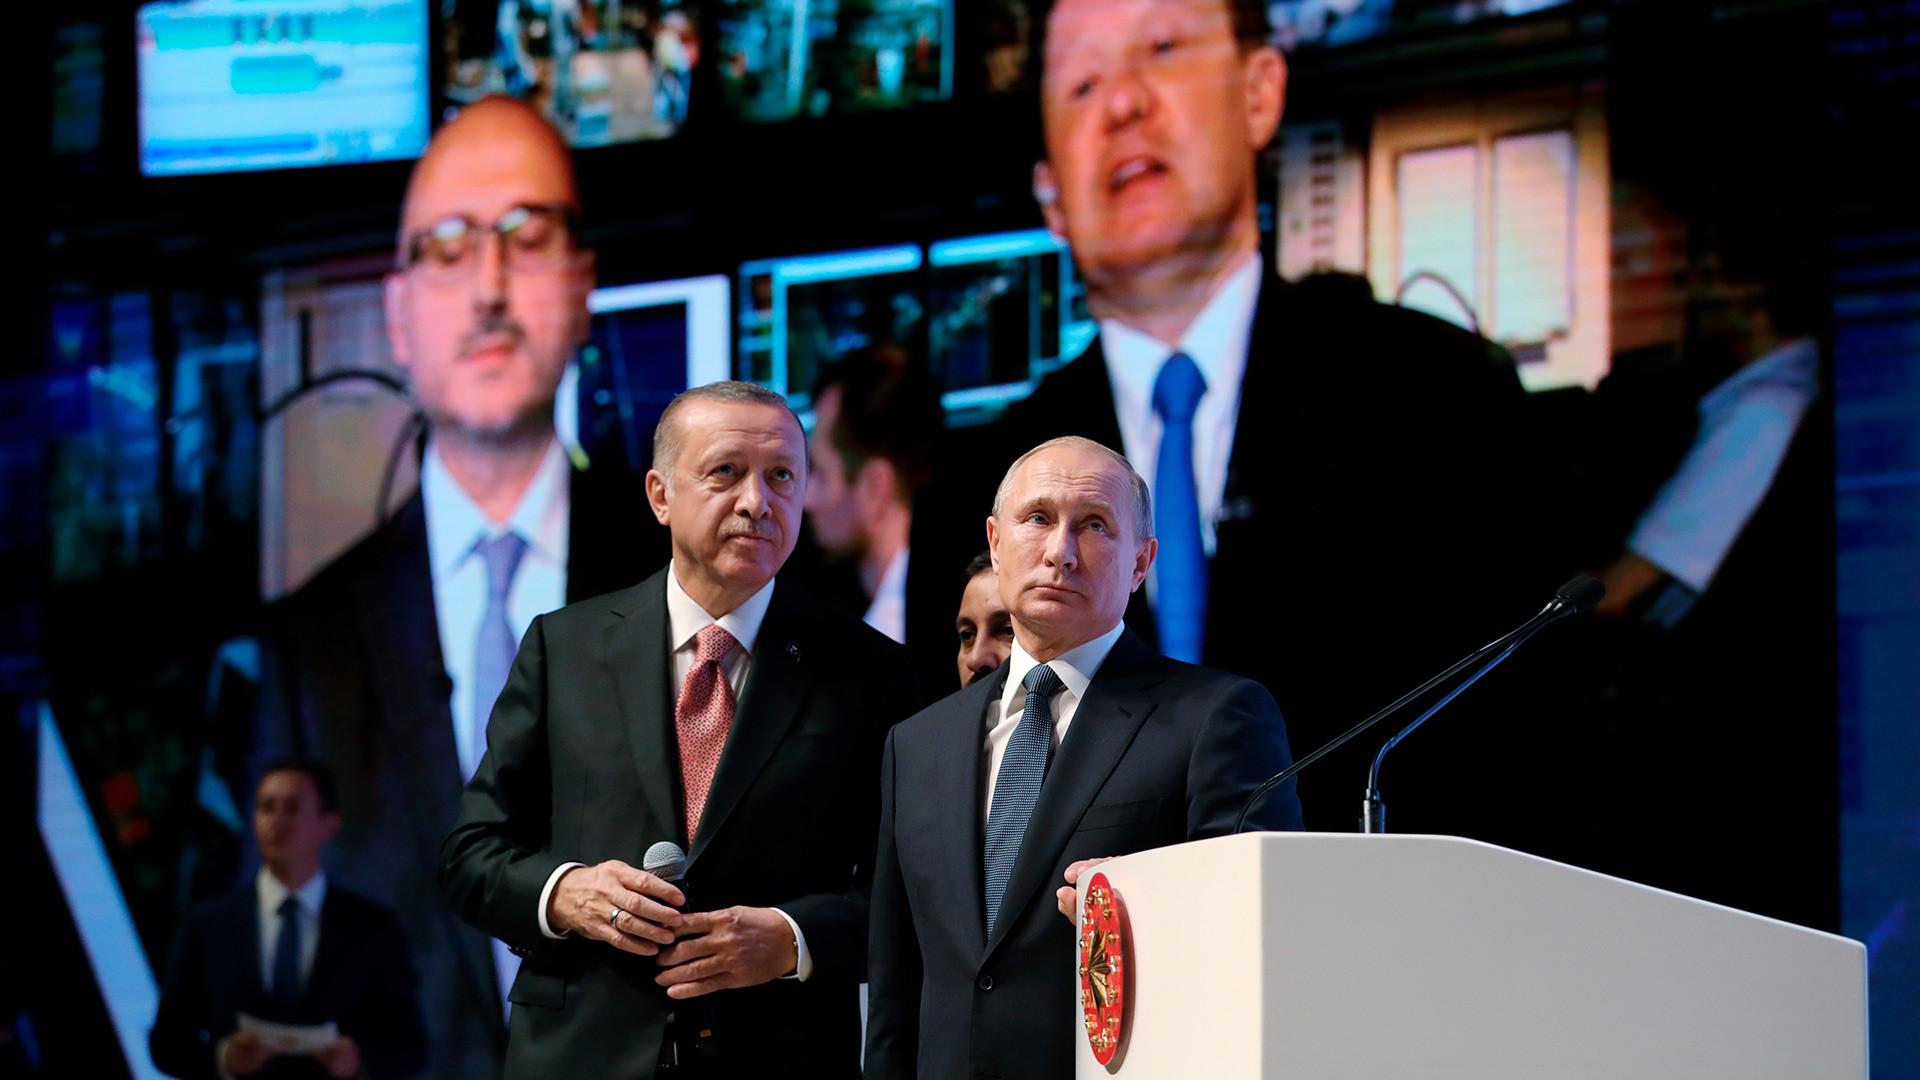 Predsjednik Rusije Vladimir Putin i predsjednik Turske Recep Erdoğan na ceremoniji završetka pomorske dionice plinovoda